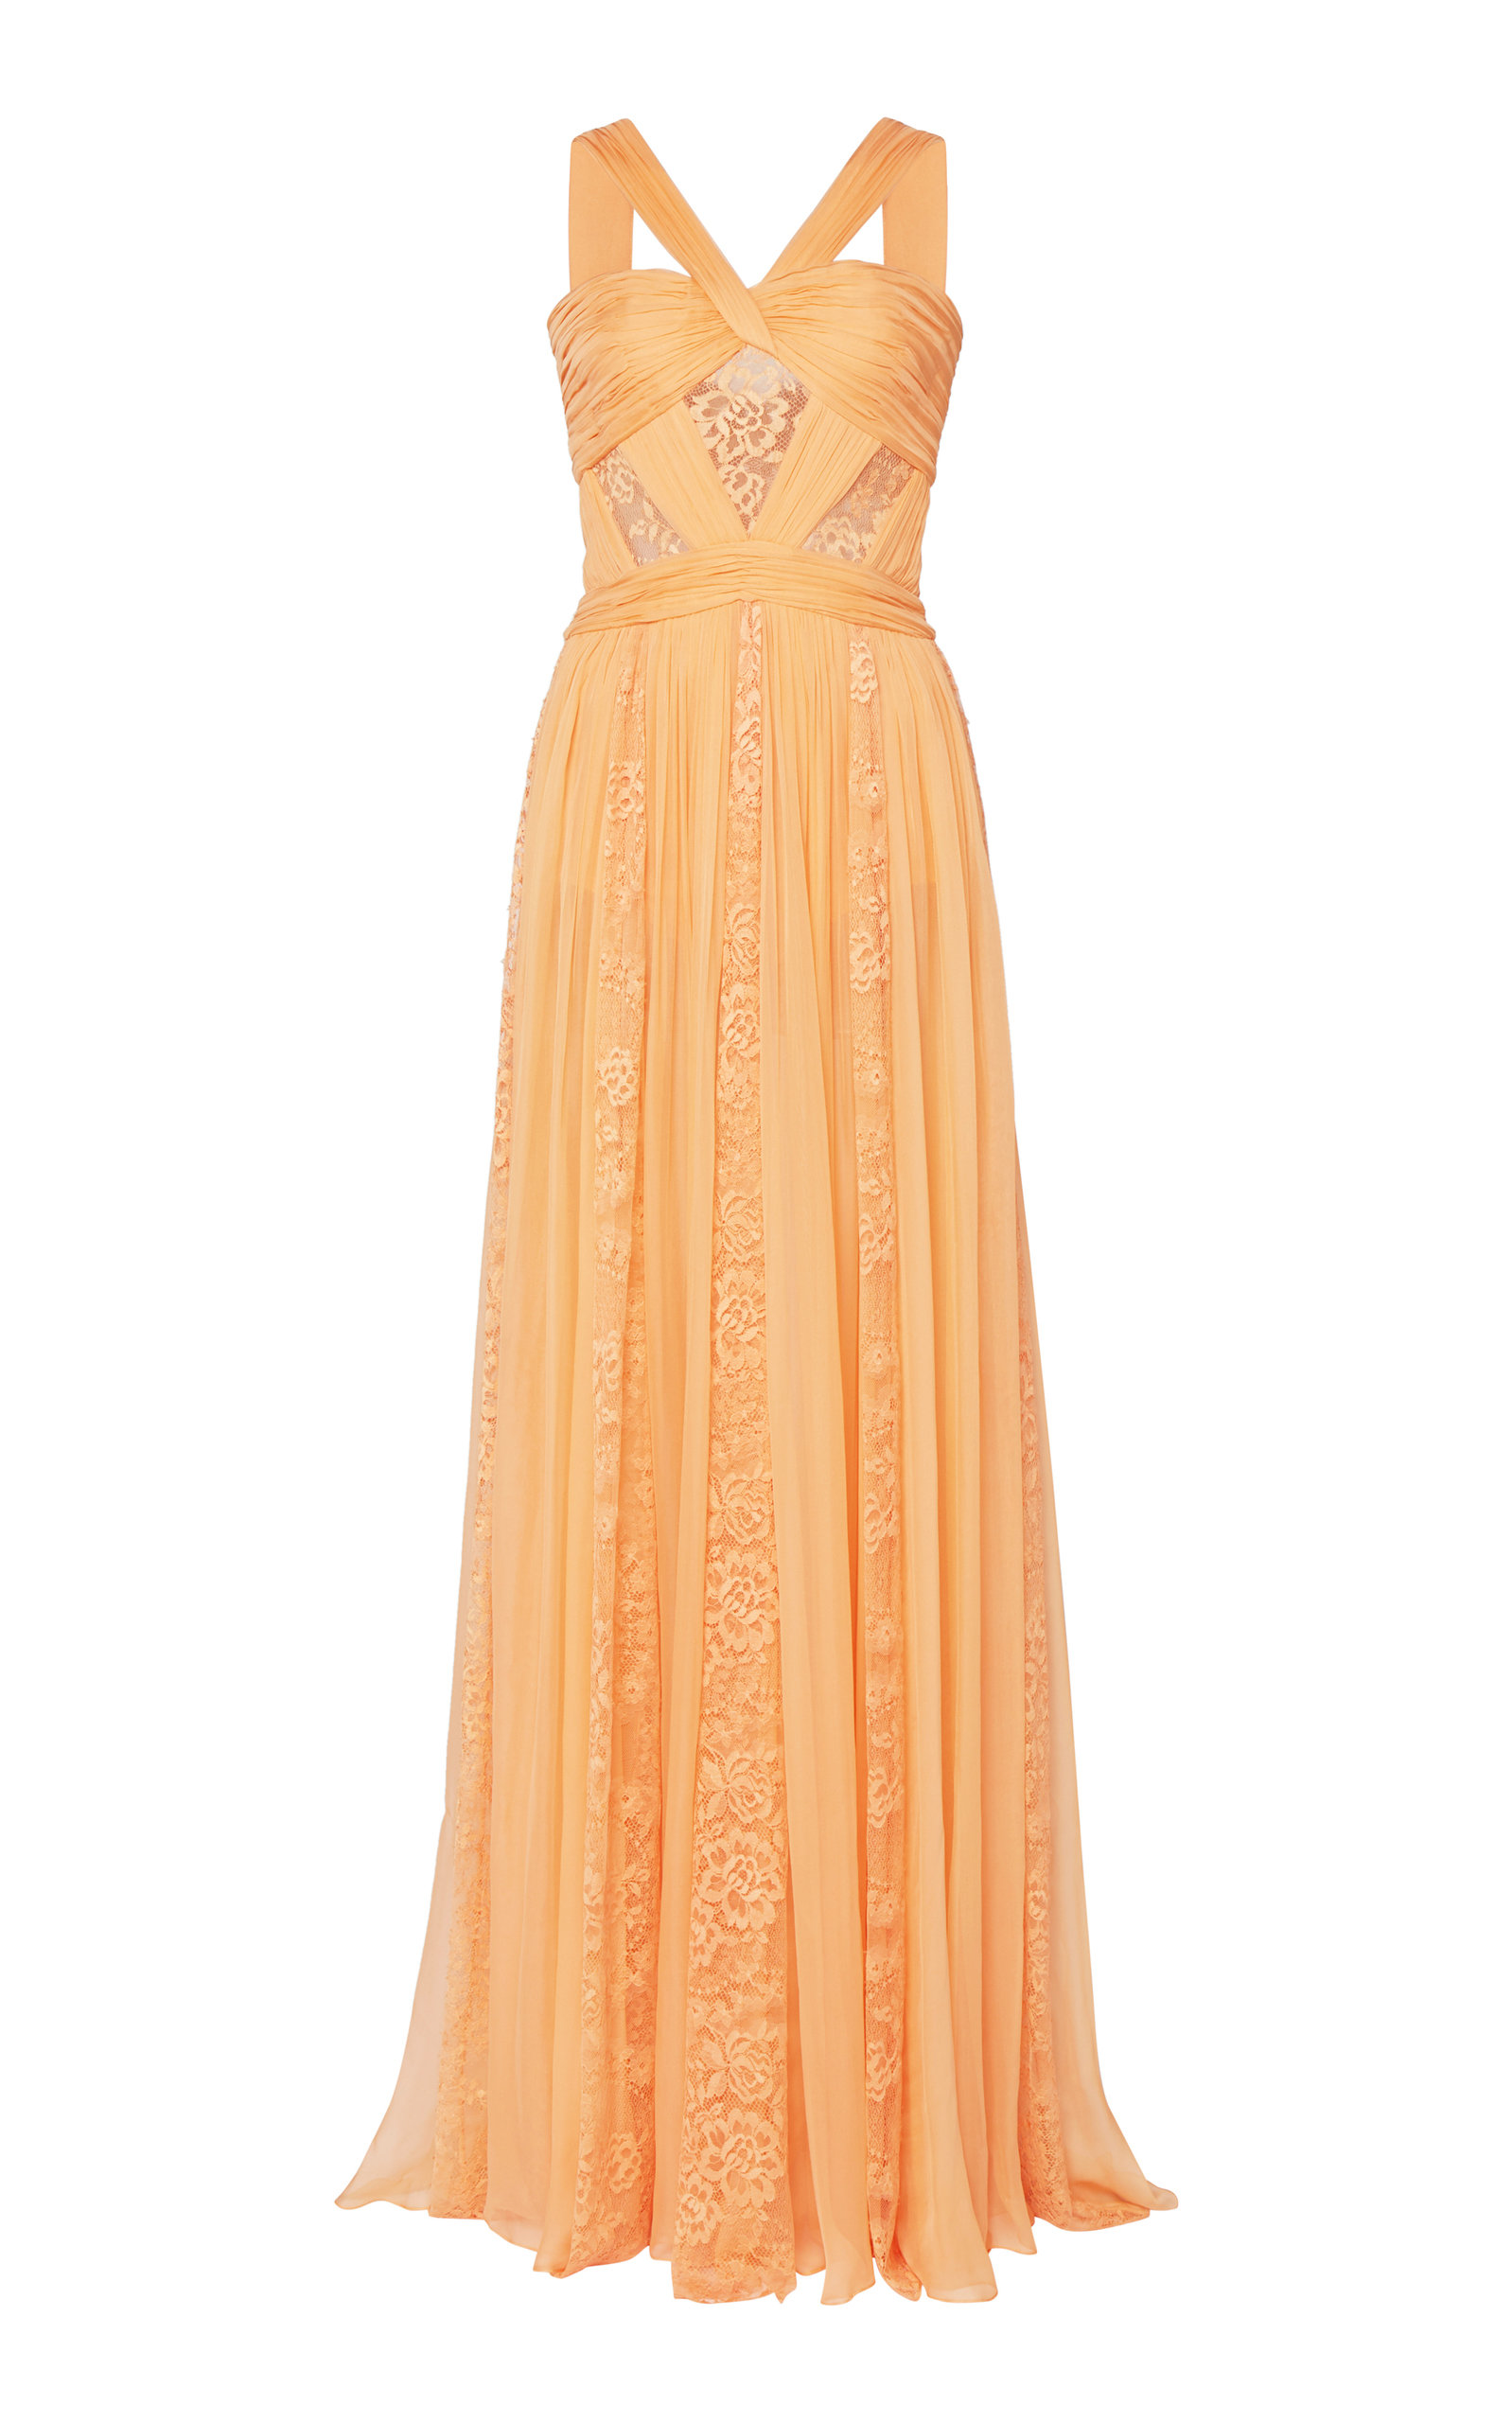 Buy Zuhair Murad Lace-Detailed Organza Dress online, shop Zuhair Murad at the best price